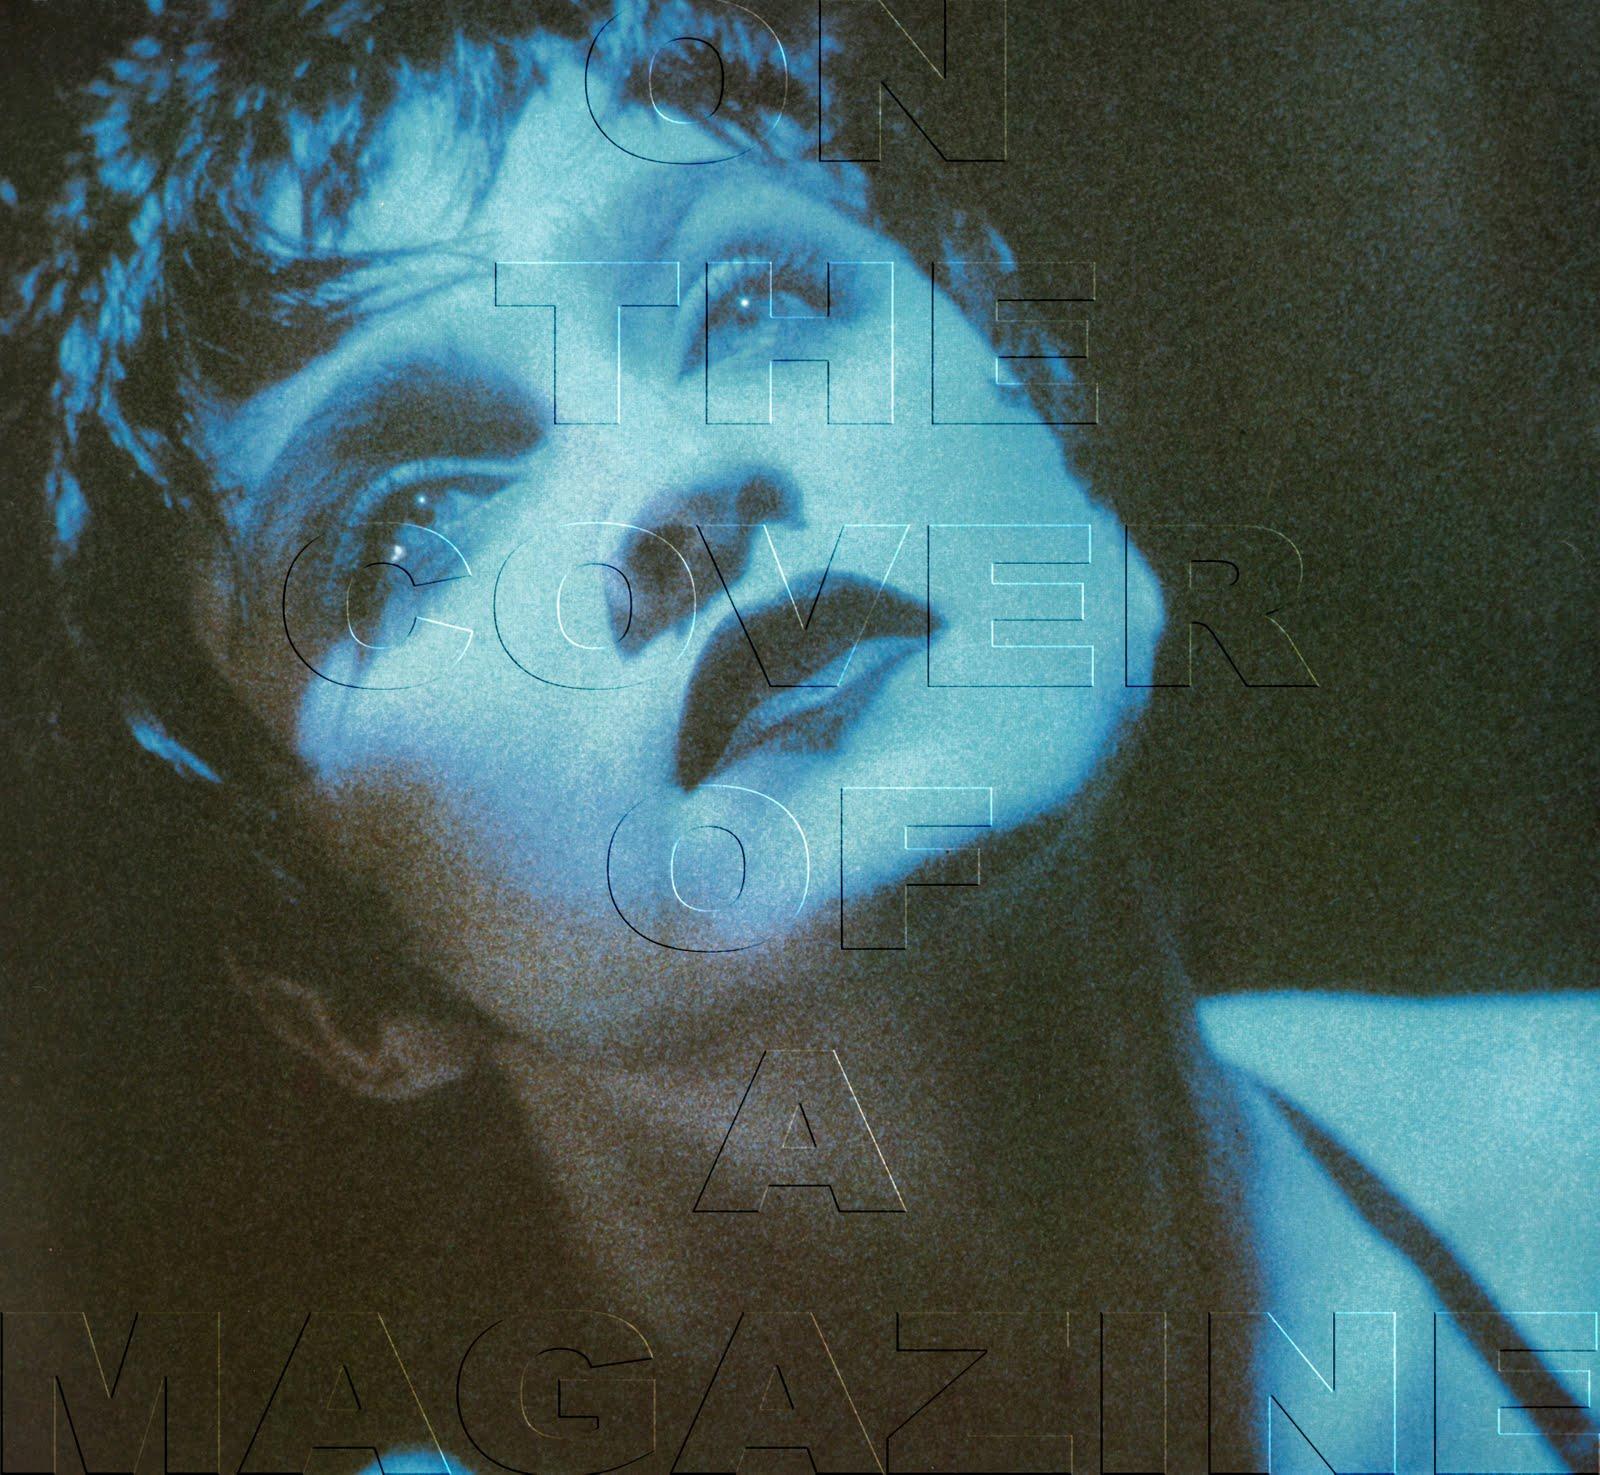 June Calendar Girl Book : Madonna on the cover of a magazine otcoam rare